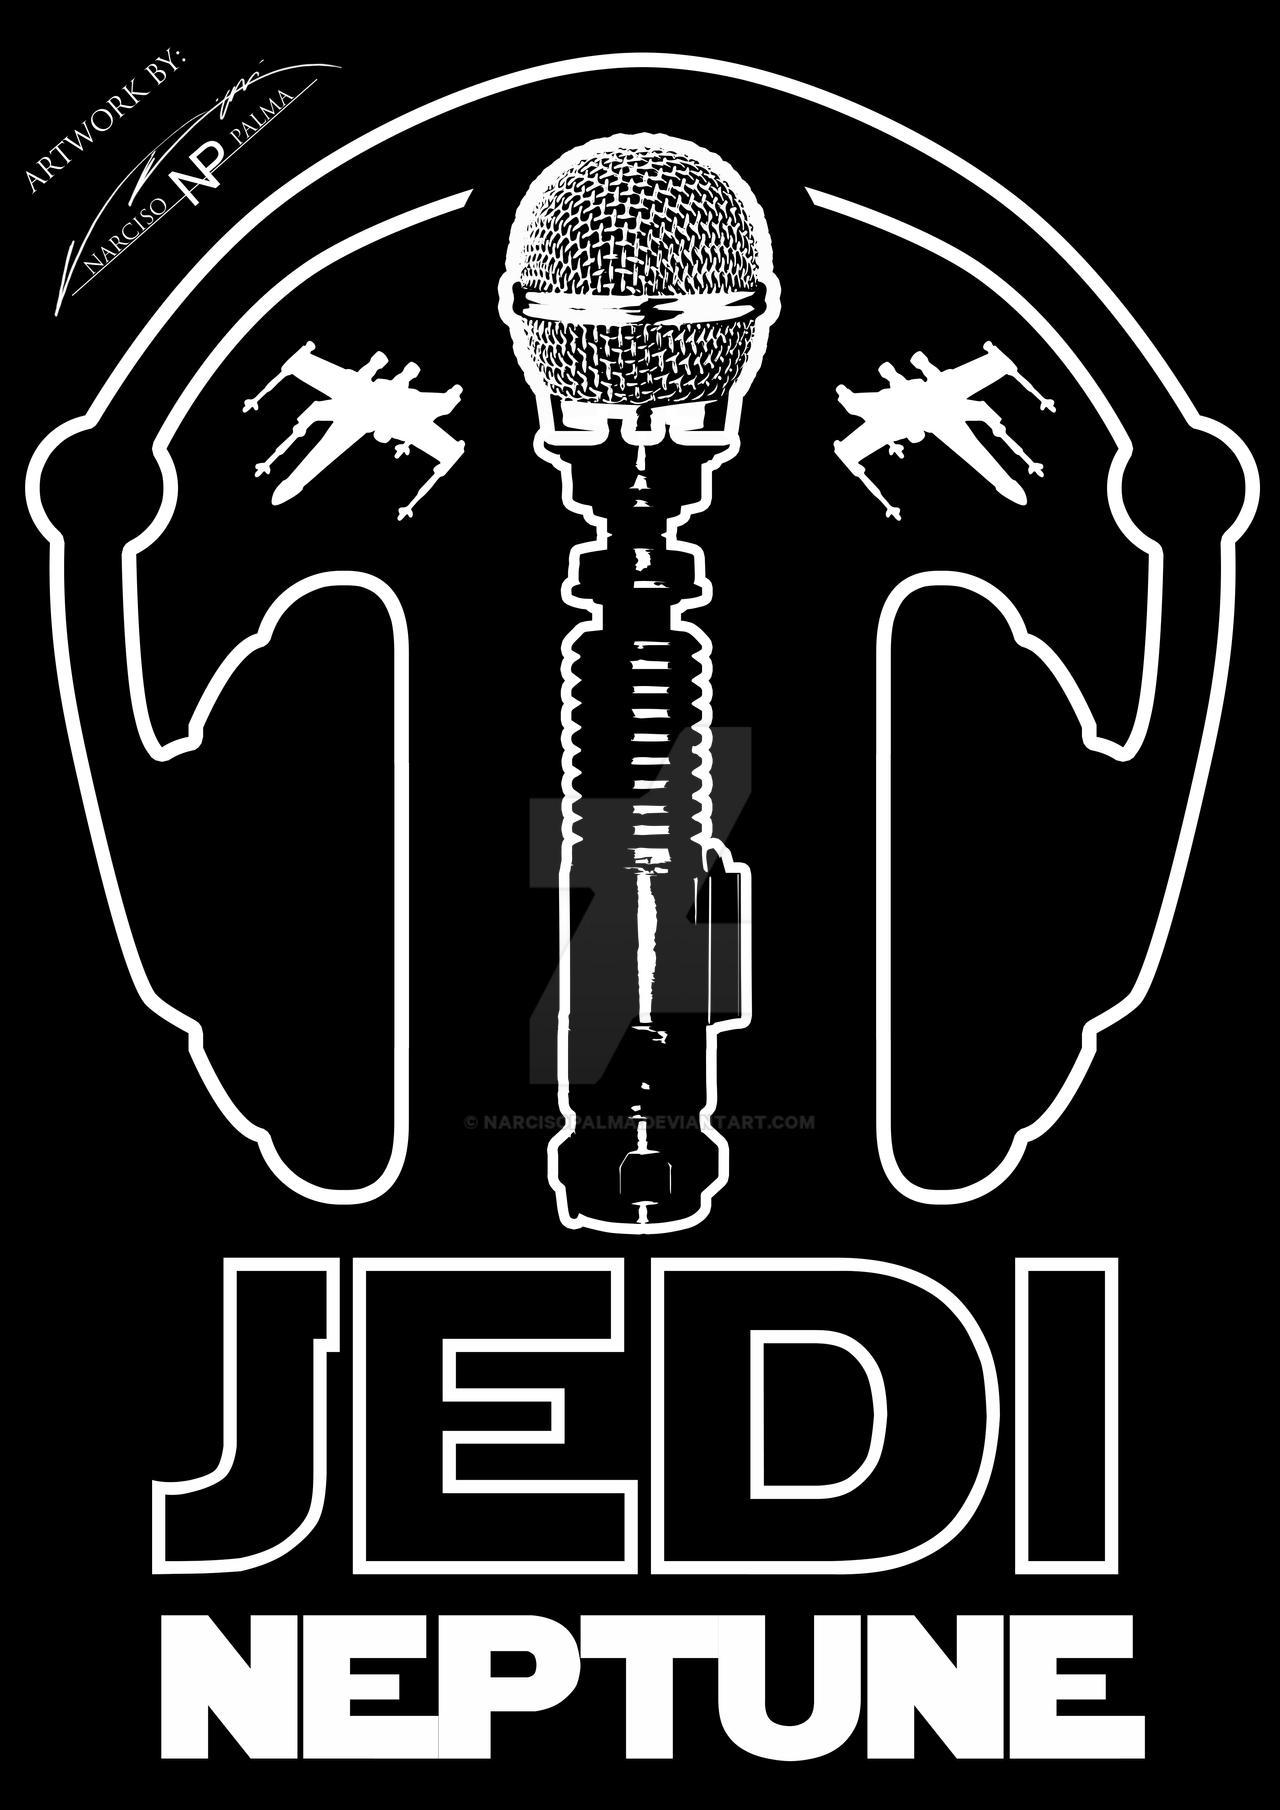 Jedi Neptune Logo - By Narciso Palma